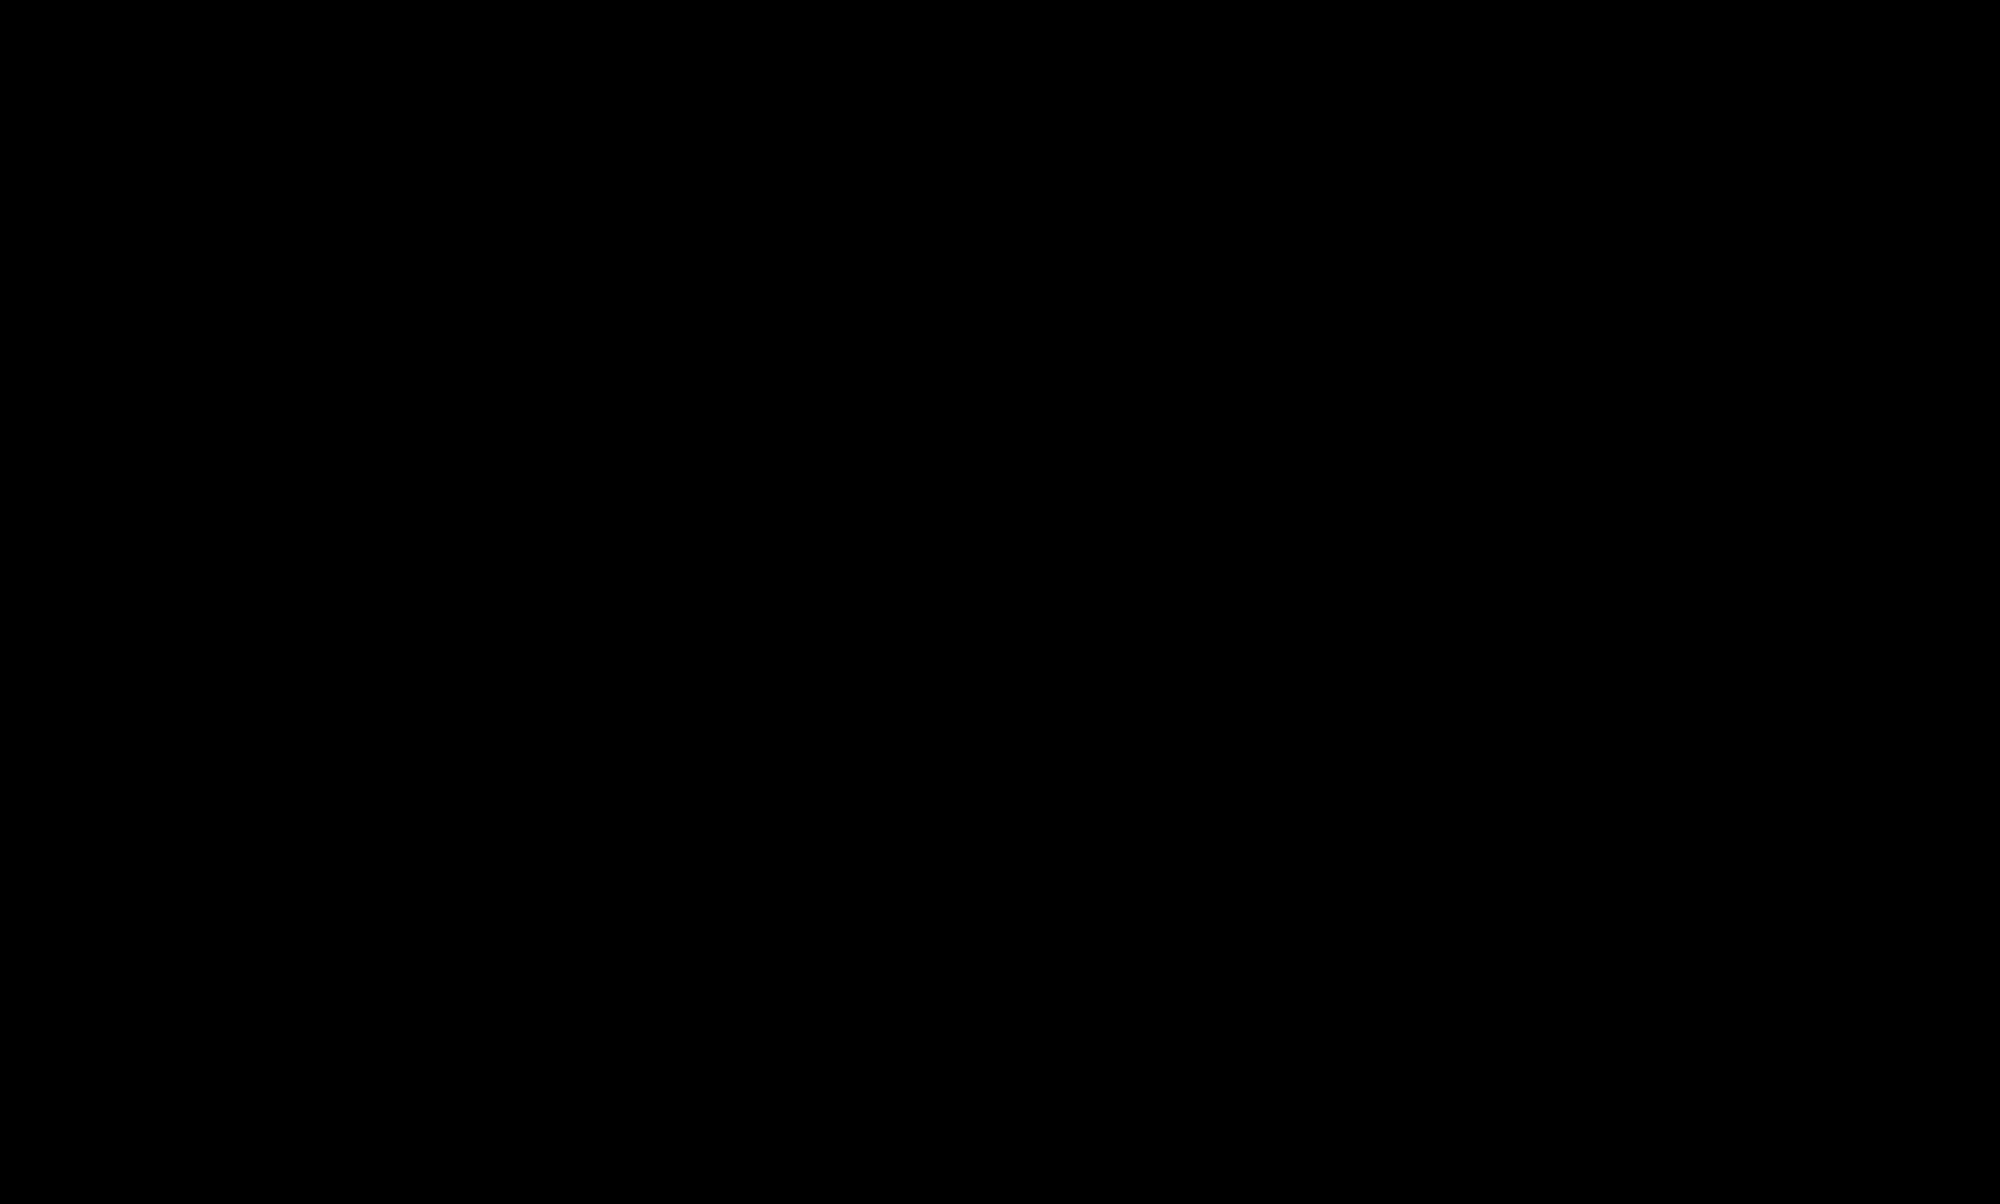 graphic library clip studios logo #92446471